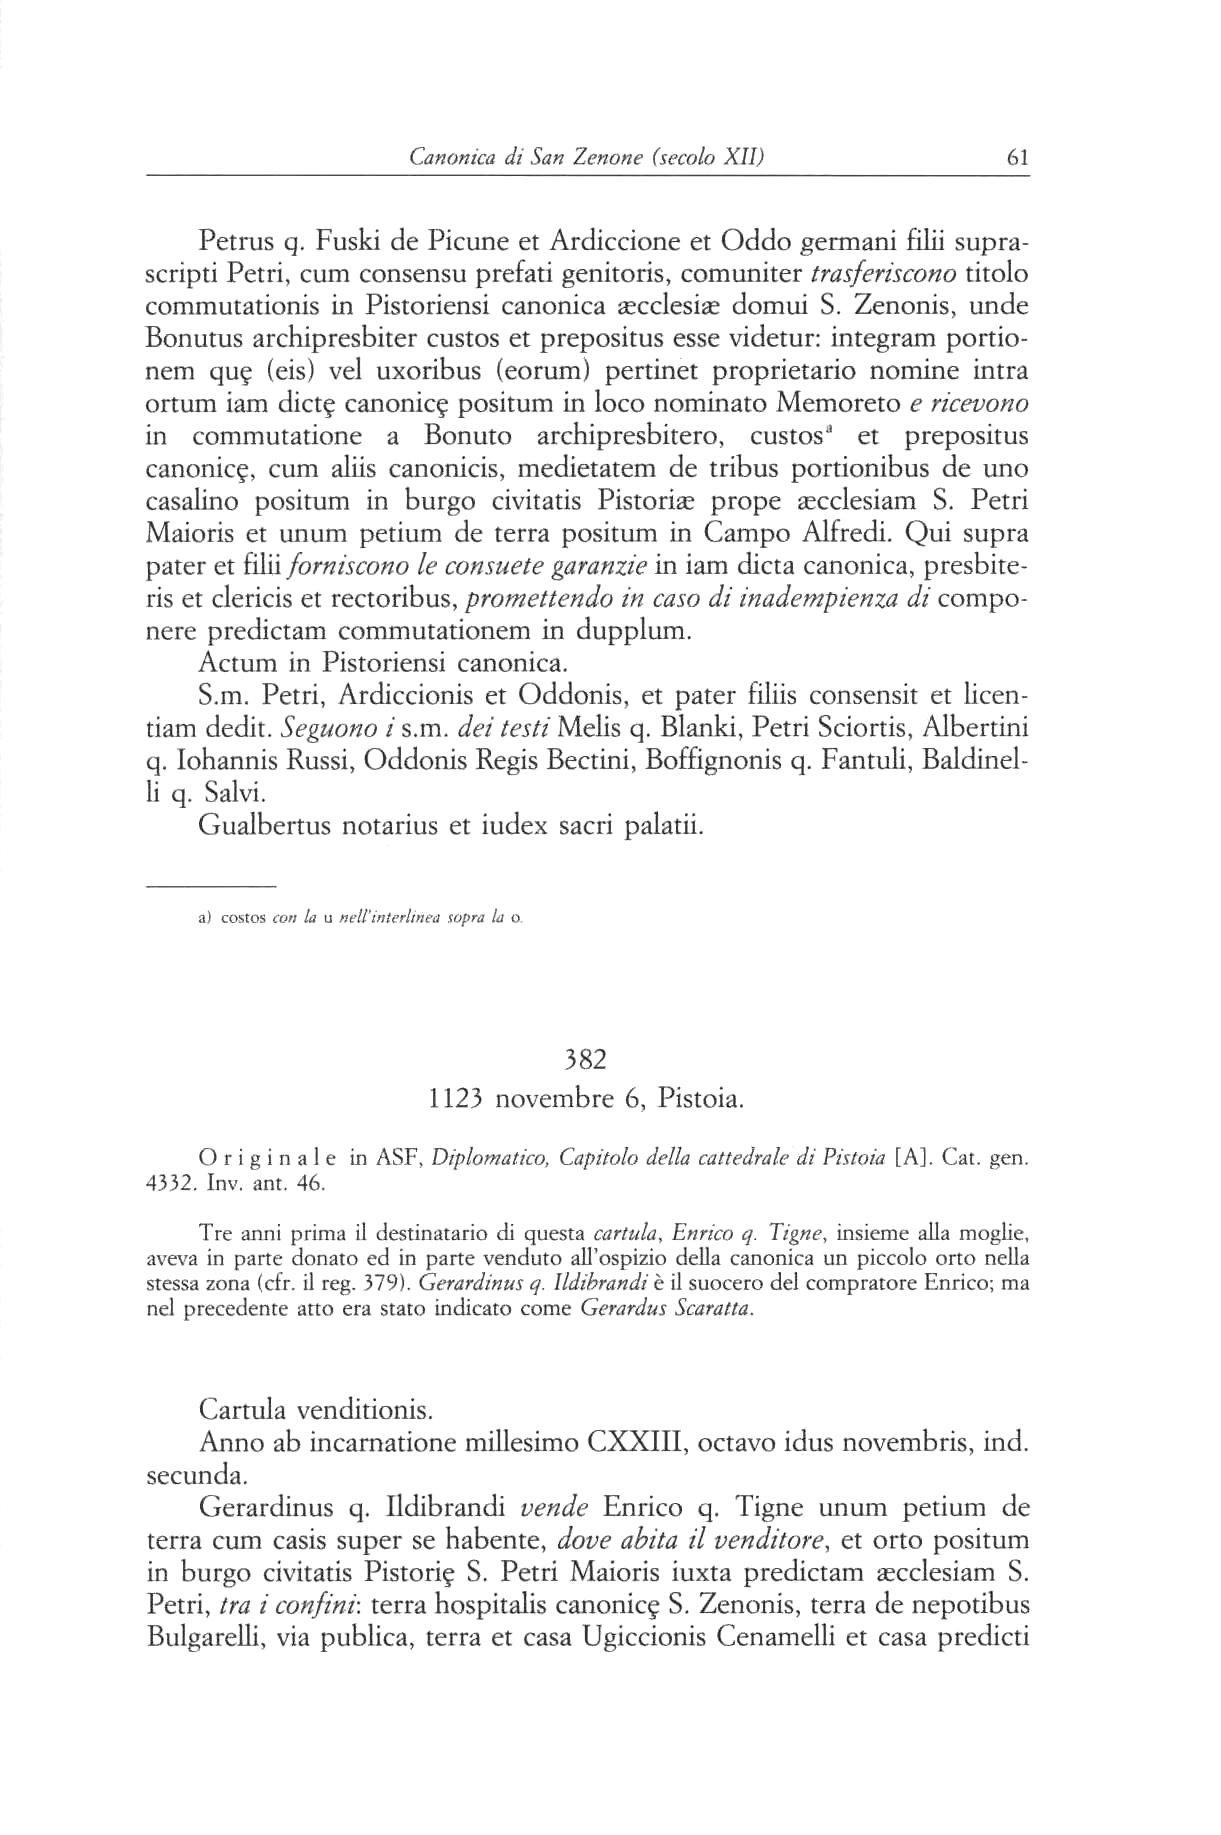 Canonica S. Zenone XII 0061.jpg